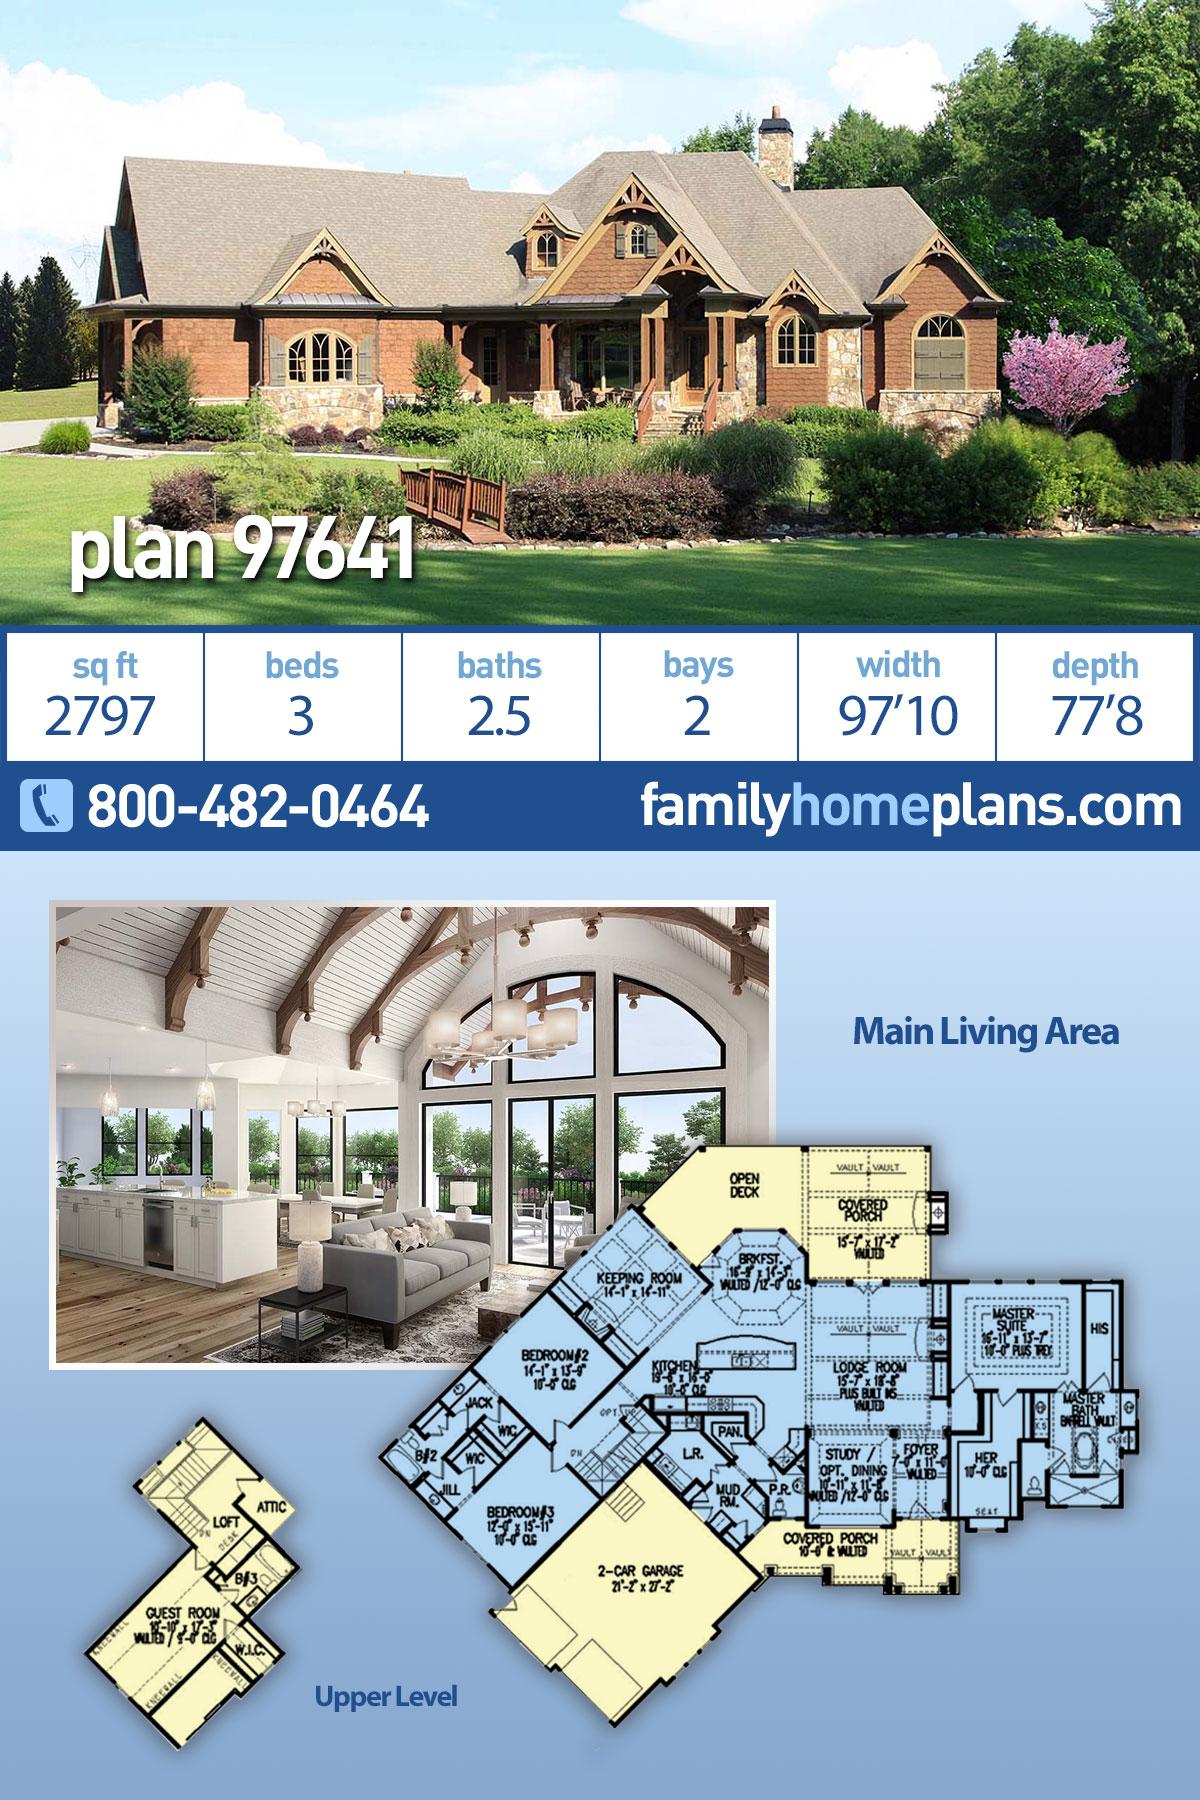 Cottage, Craftsman House Plan 97641 with 3 Beds, 3 Baths, 2 Car Garage